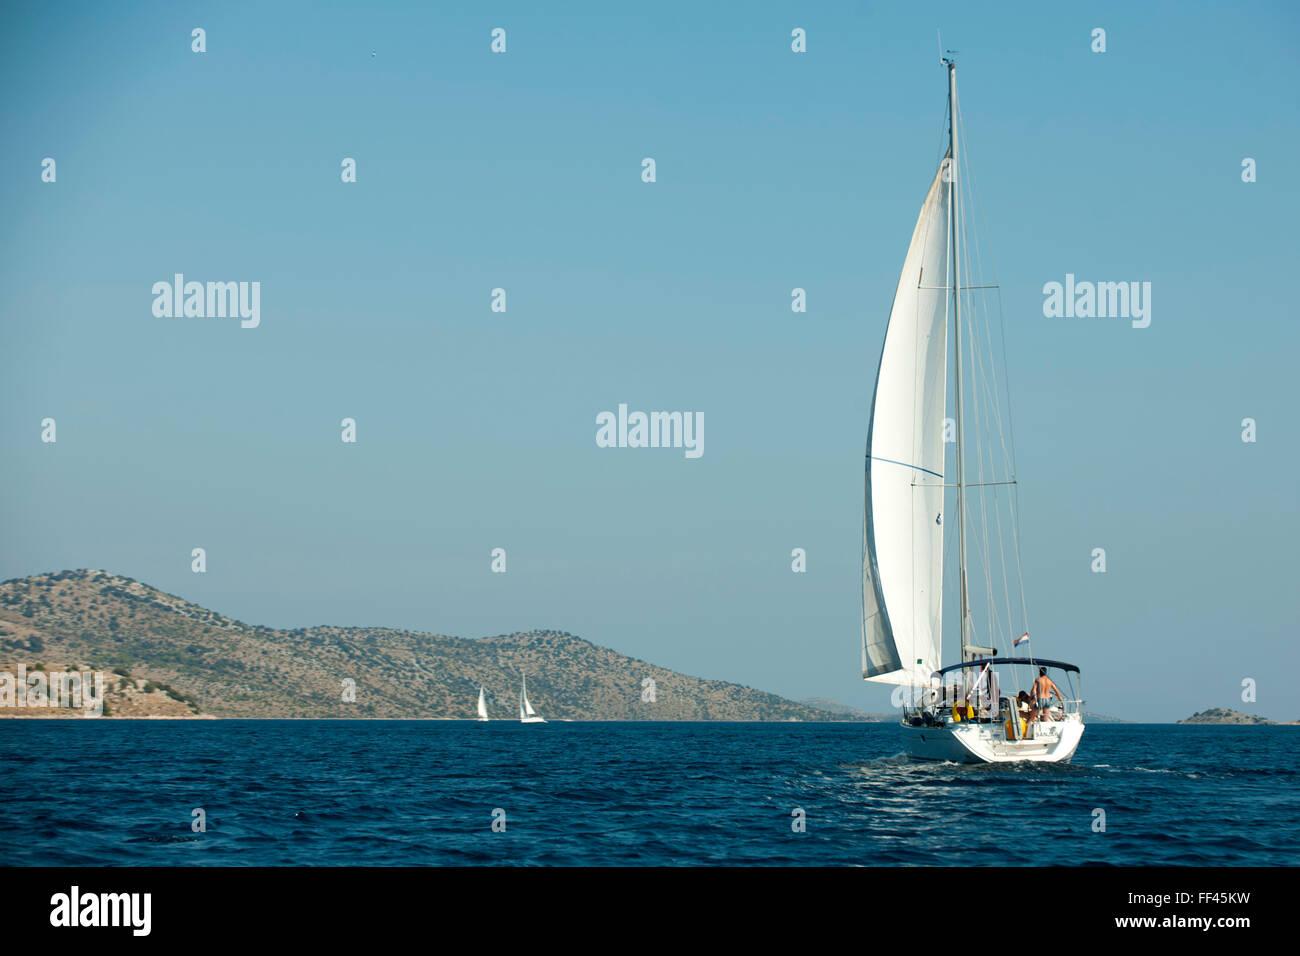 Kroatien, Dalmatien, Nationalpark Kornaten - Stock Image